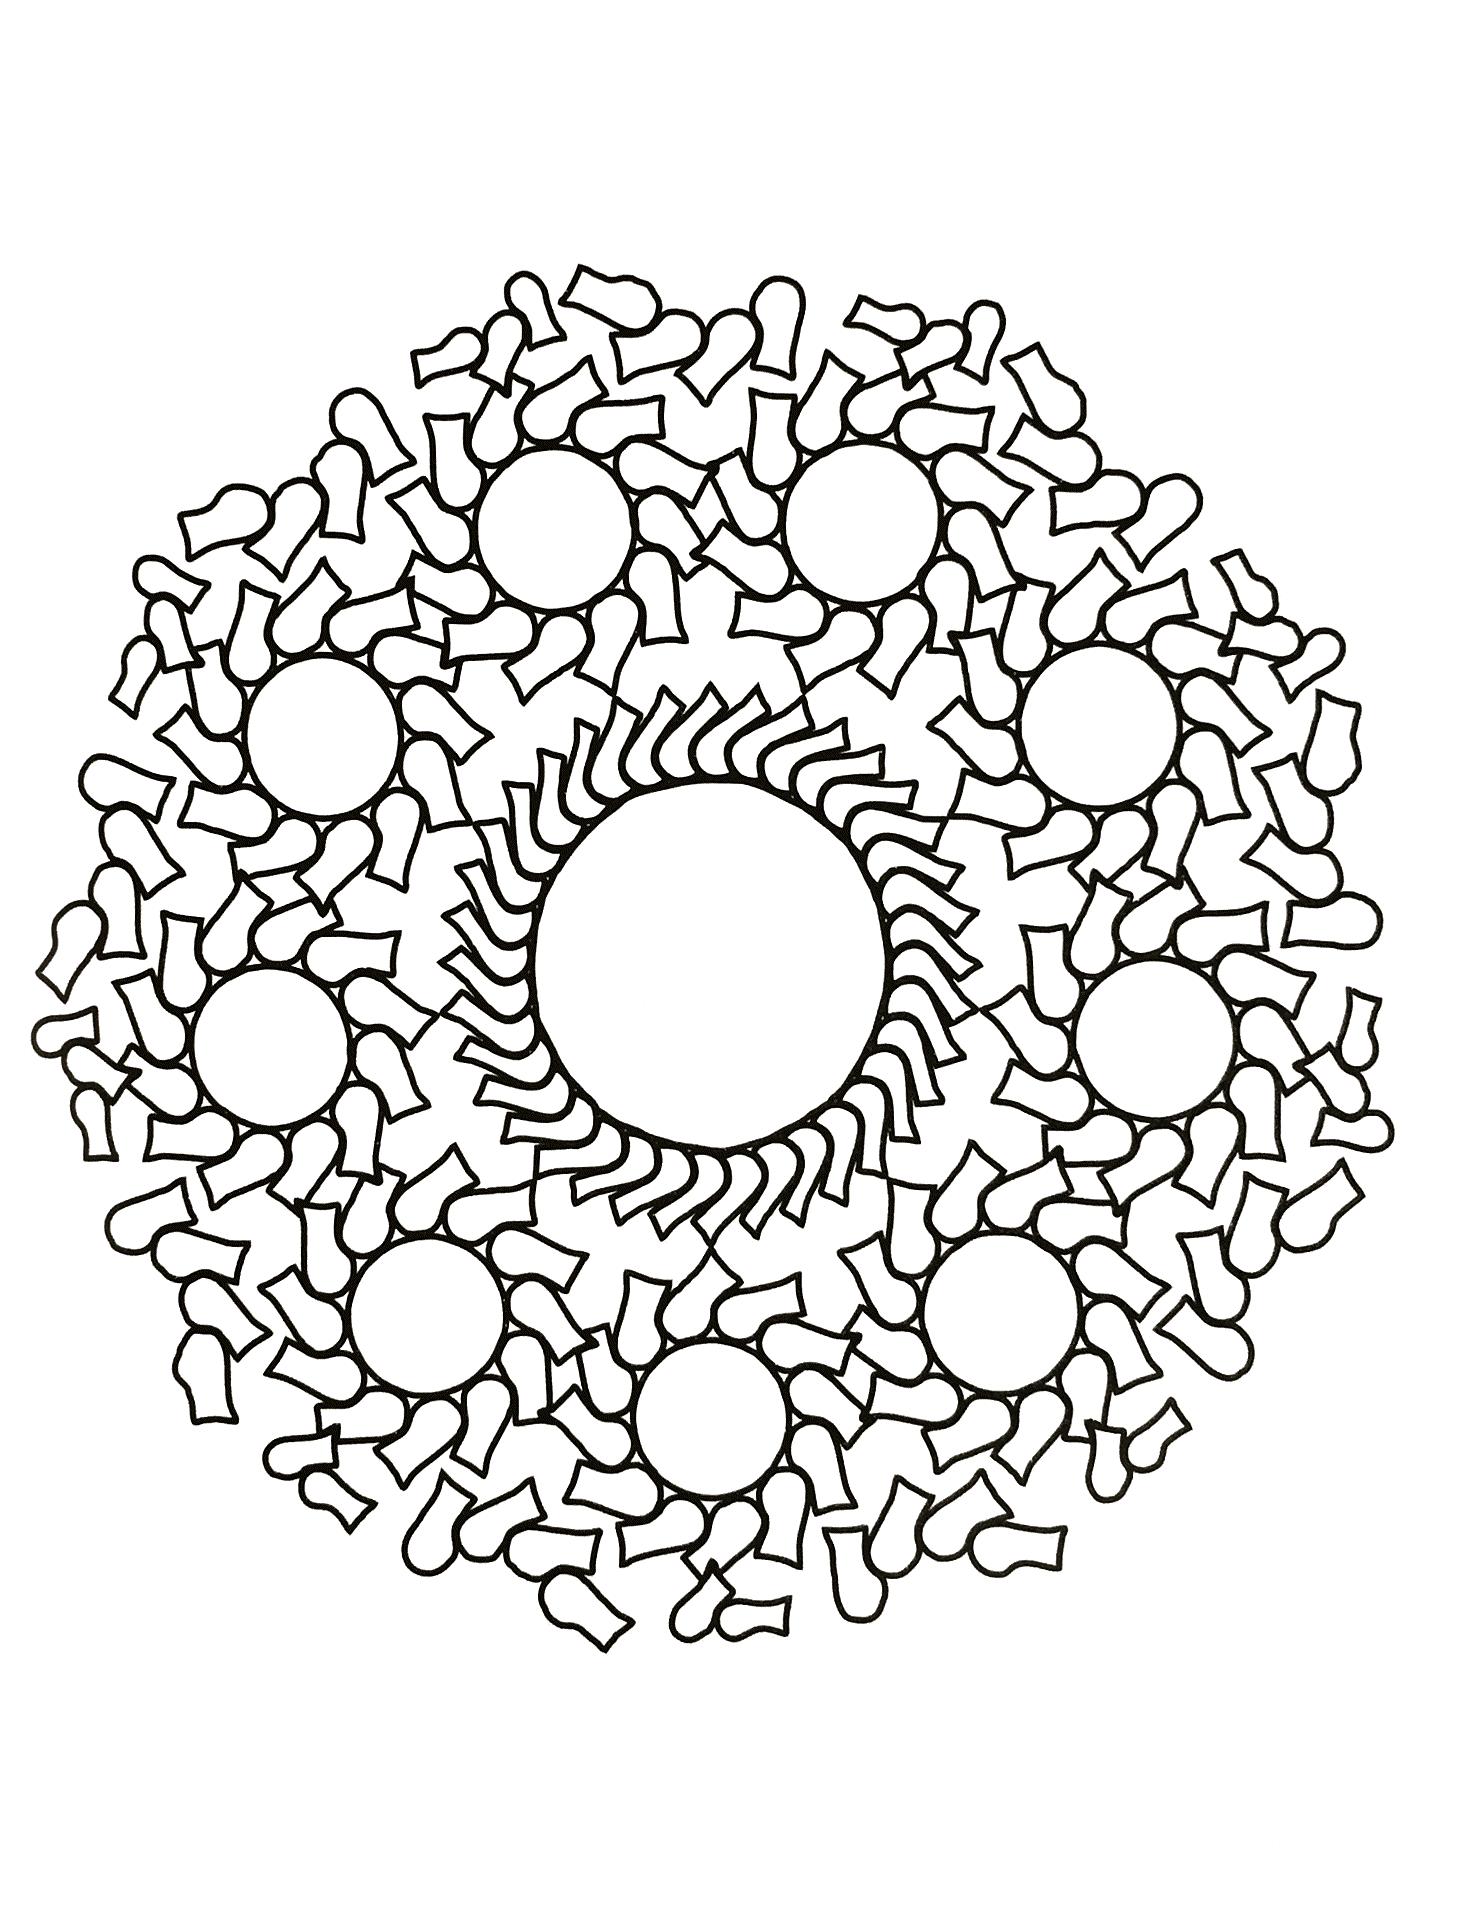 Beautiful Mandalas coloring page to print and color